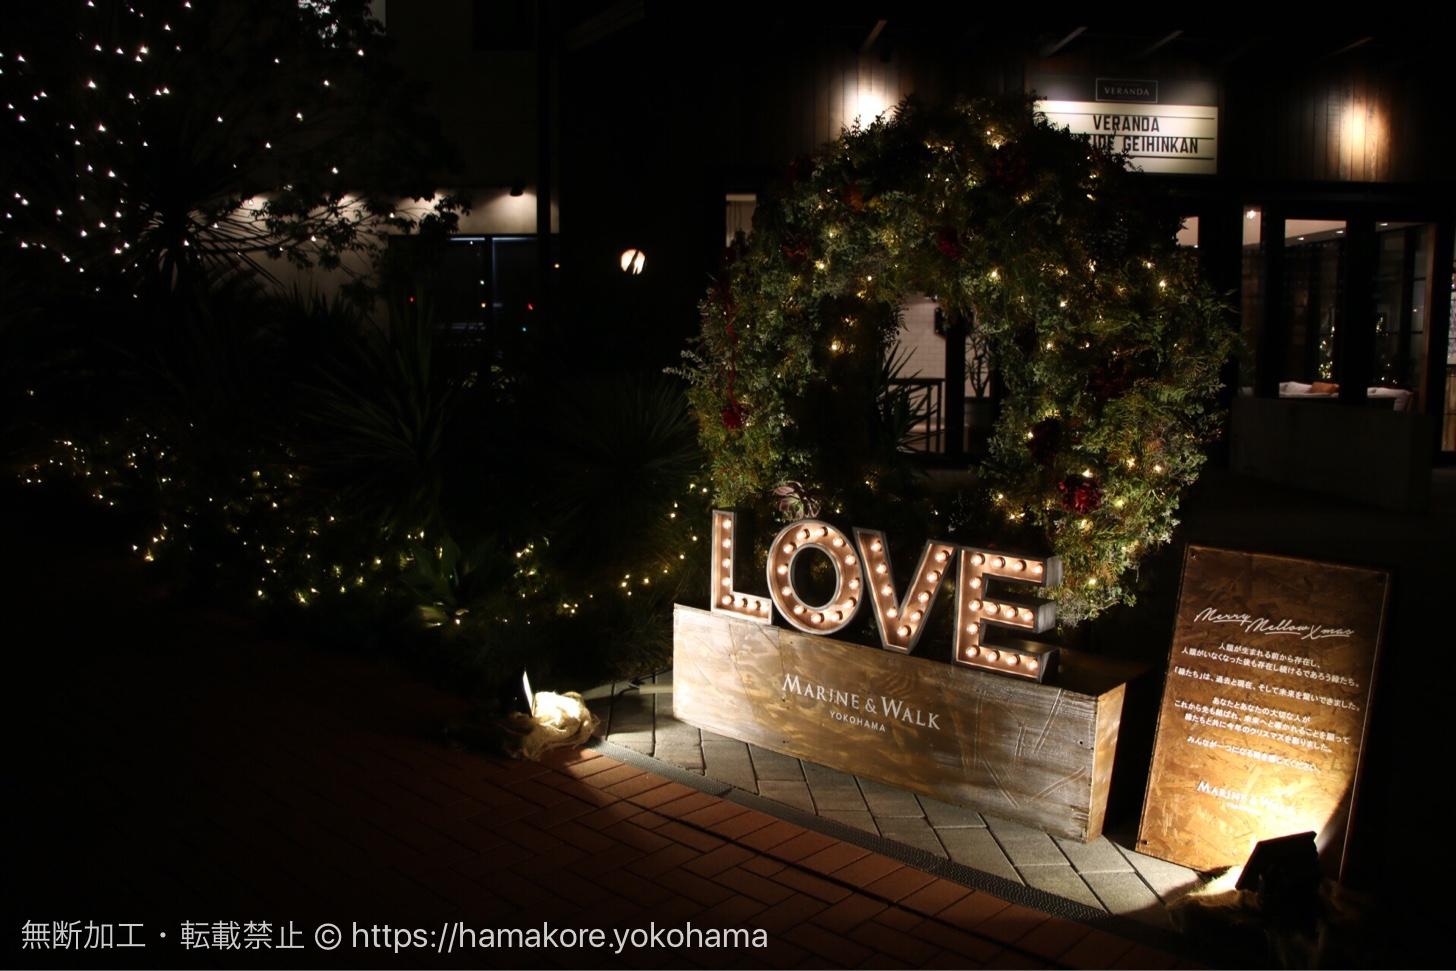 MARINE & WALK YOKOHAMAのクリスマスイルミネーション LOVEのクリスマスリース